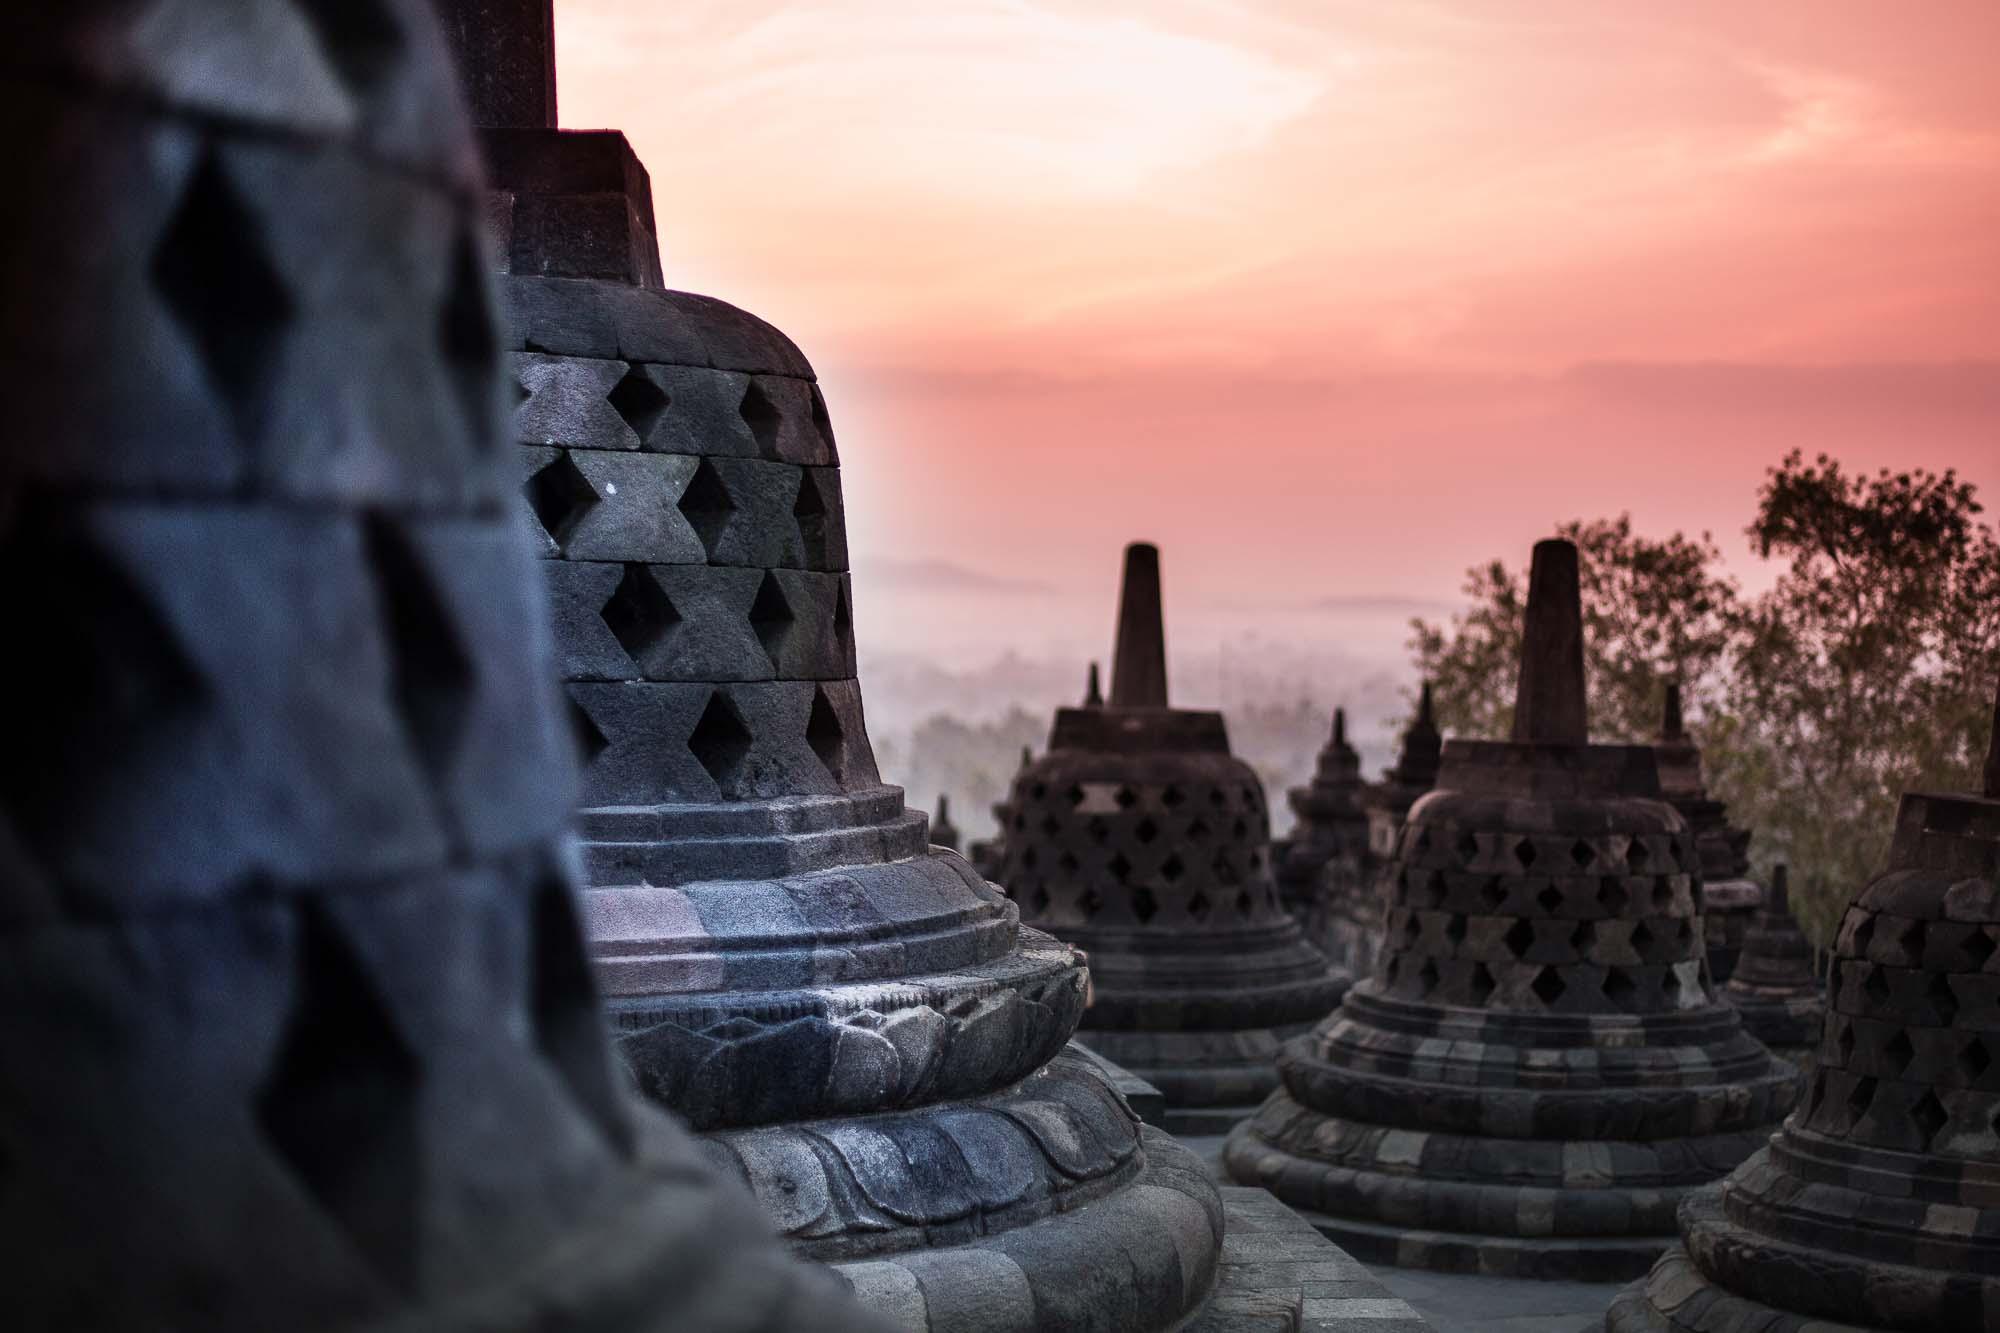 INDONESIA_2015_02 BOROBODUR-PRAMBANAN-YOGYA_JusMedic_142